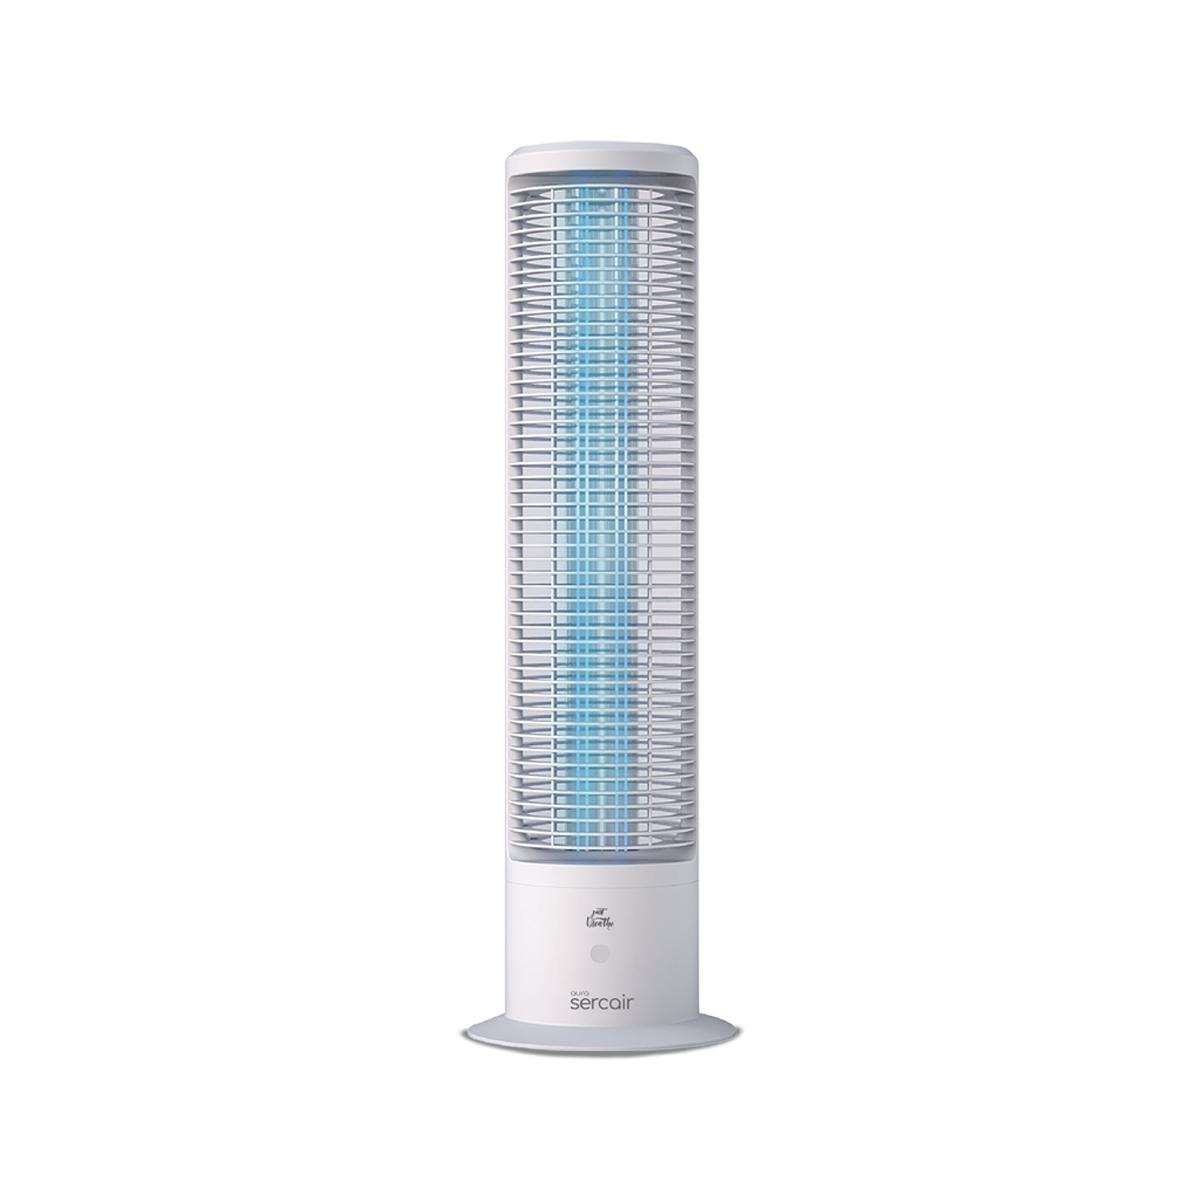 Lampa UVC pentru sterilizare, Model D9001, 36 W / 60 W, Senzor de prezenta, Aura, Alb, Sercair